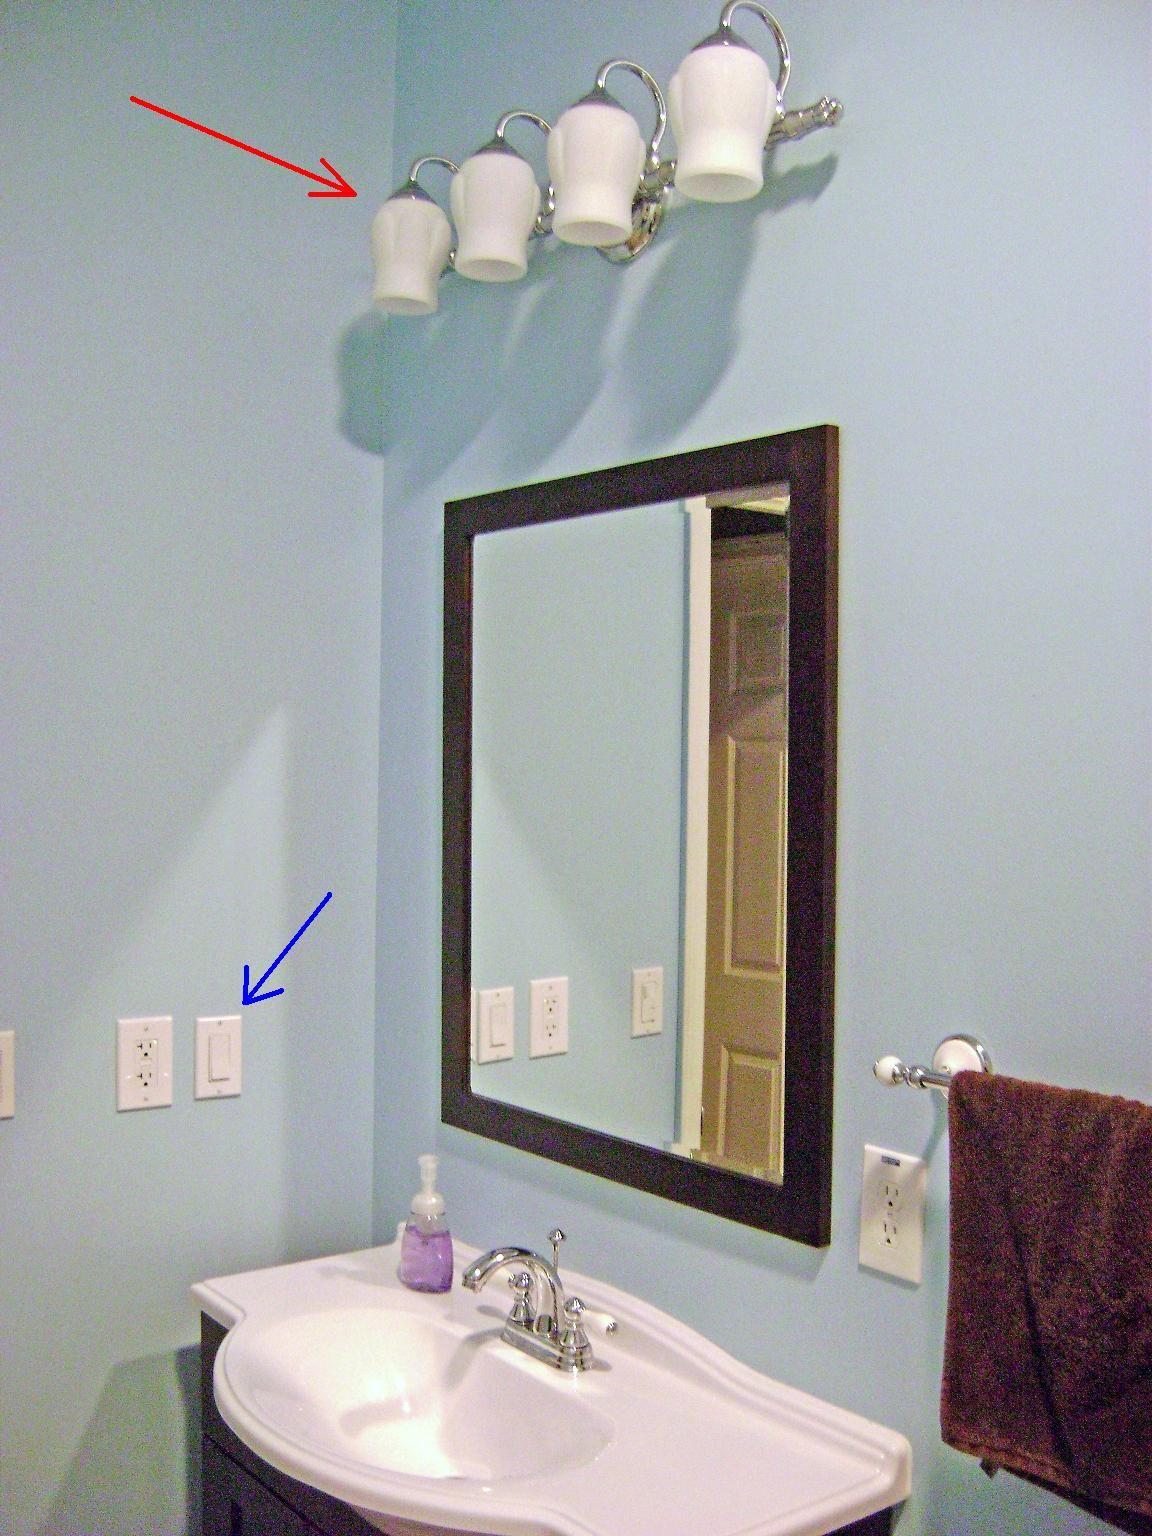 Awe Inspiring How To Finish A Basement Bathroom Vanity Light Wiring Bathroom Wiring 101 Ivorowellnesstrialsorg